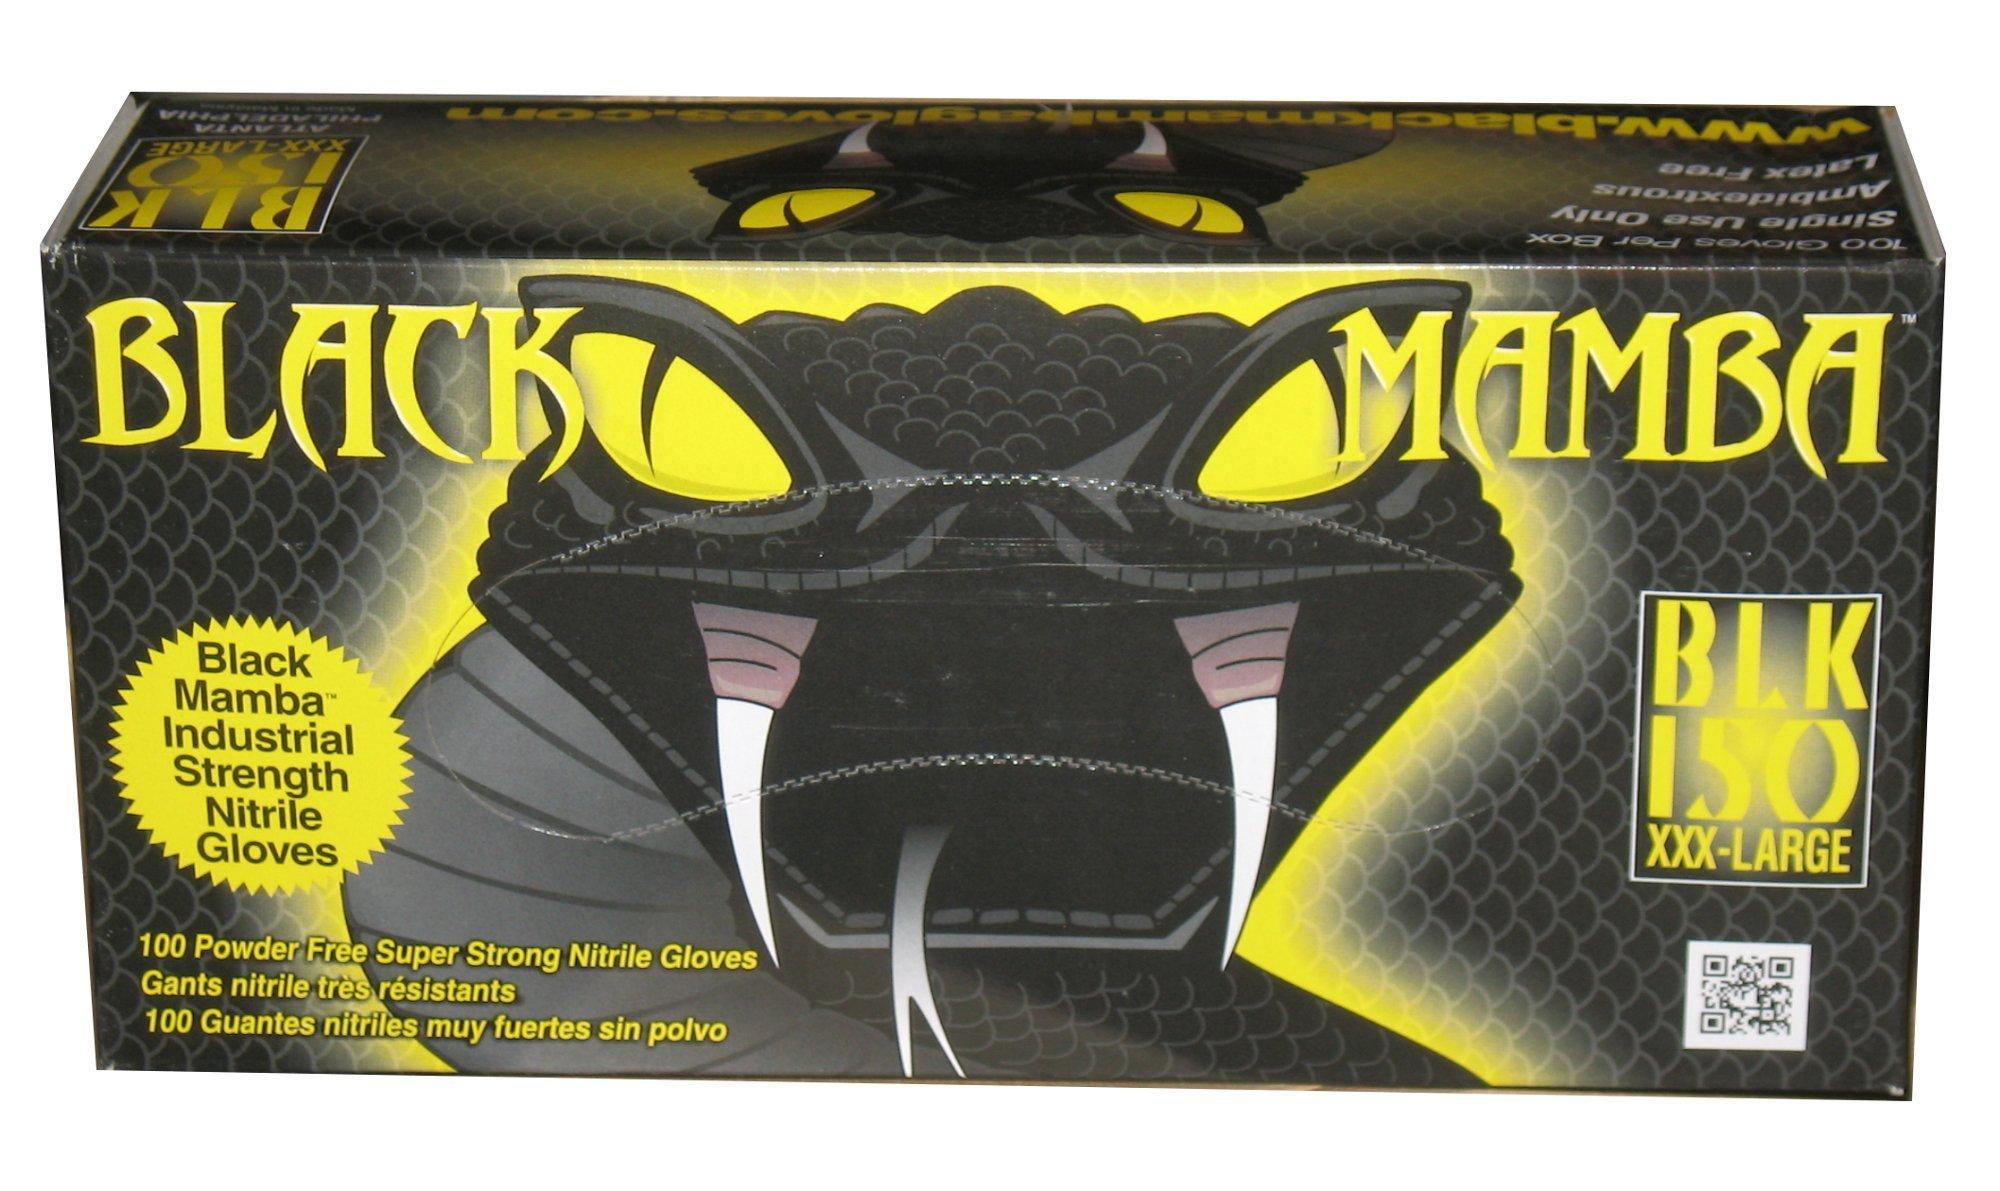 Black Mamba Super Strong Nitrile 100 Glove BOX (EXTRA EXTRA EXTRA LARGE) by Black Mamba Gloves